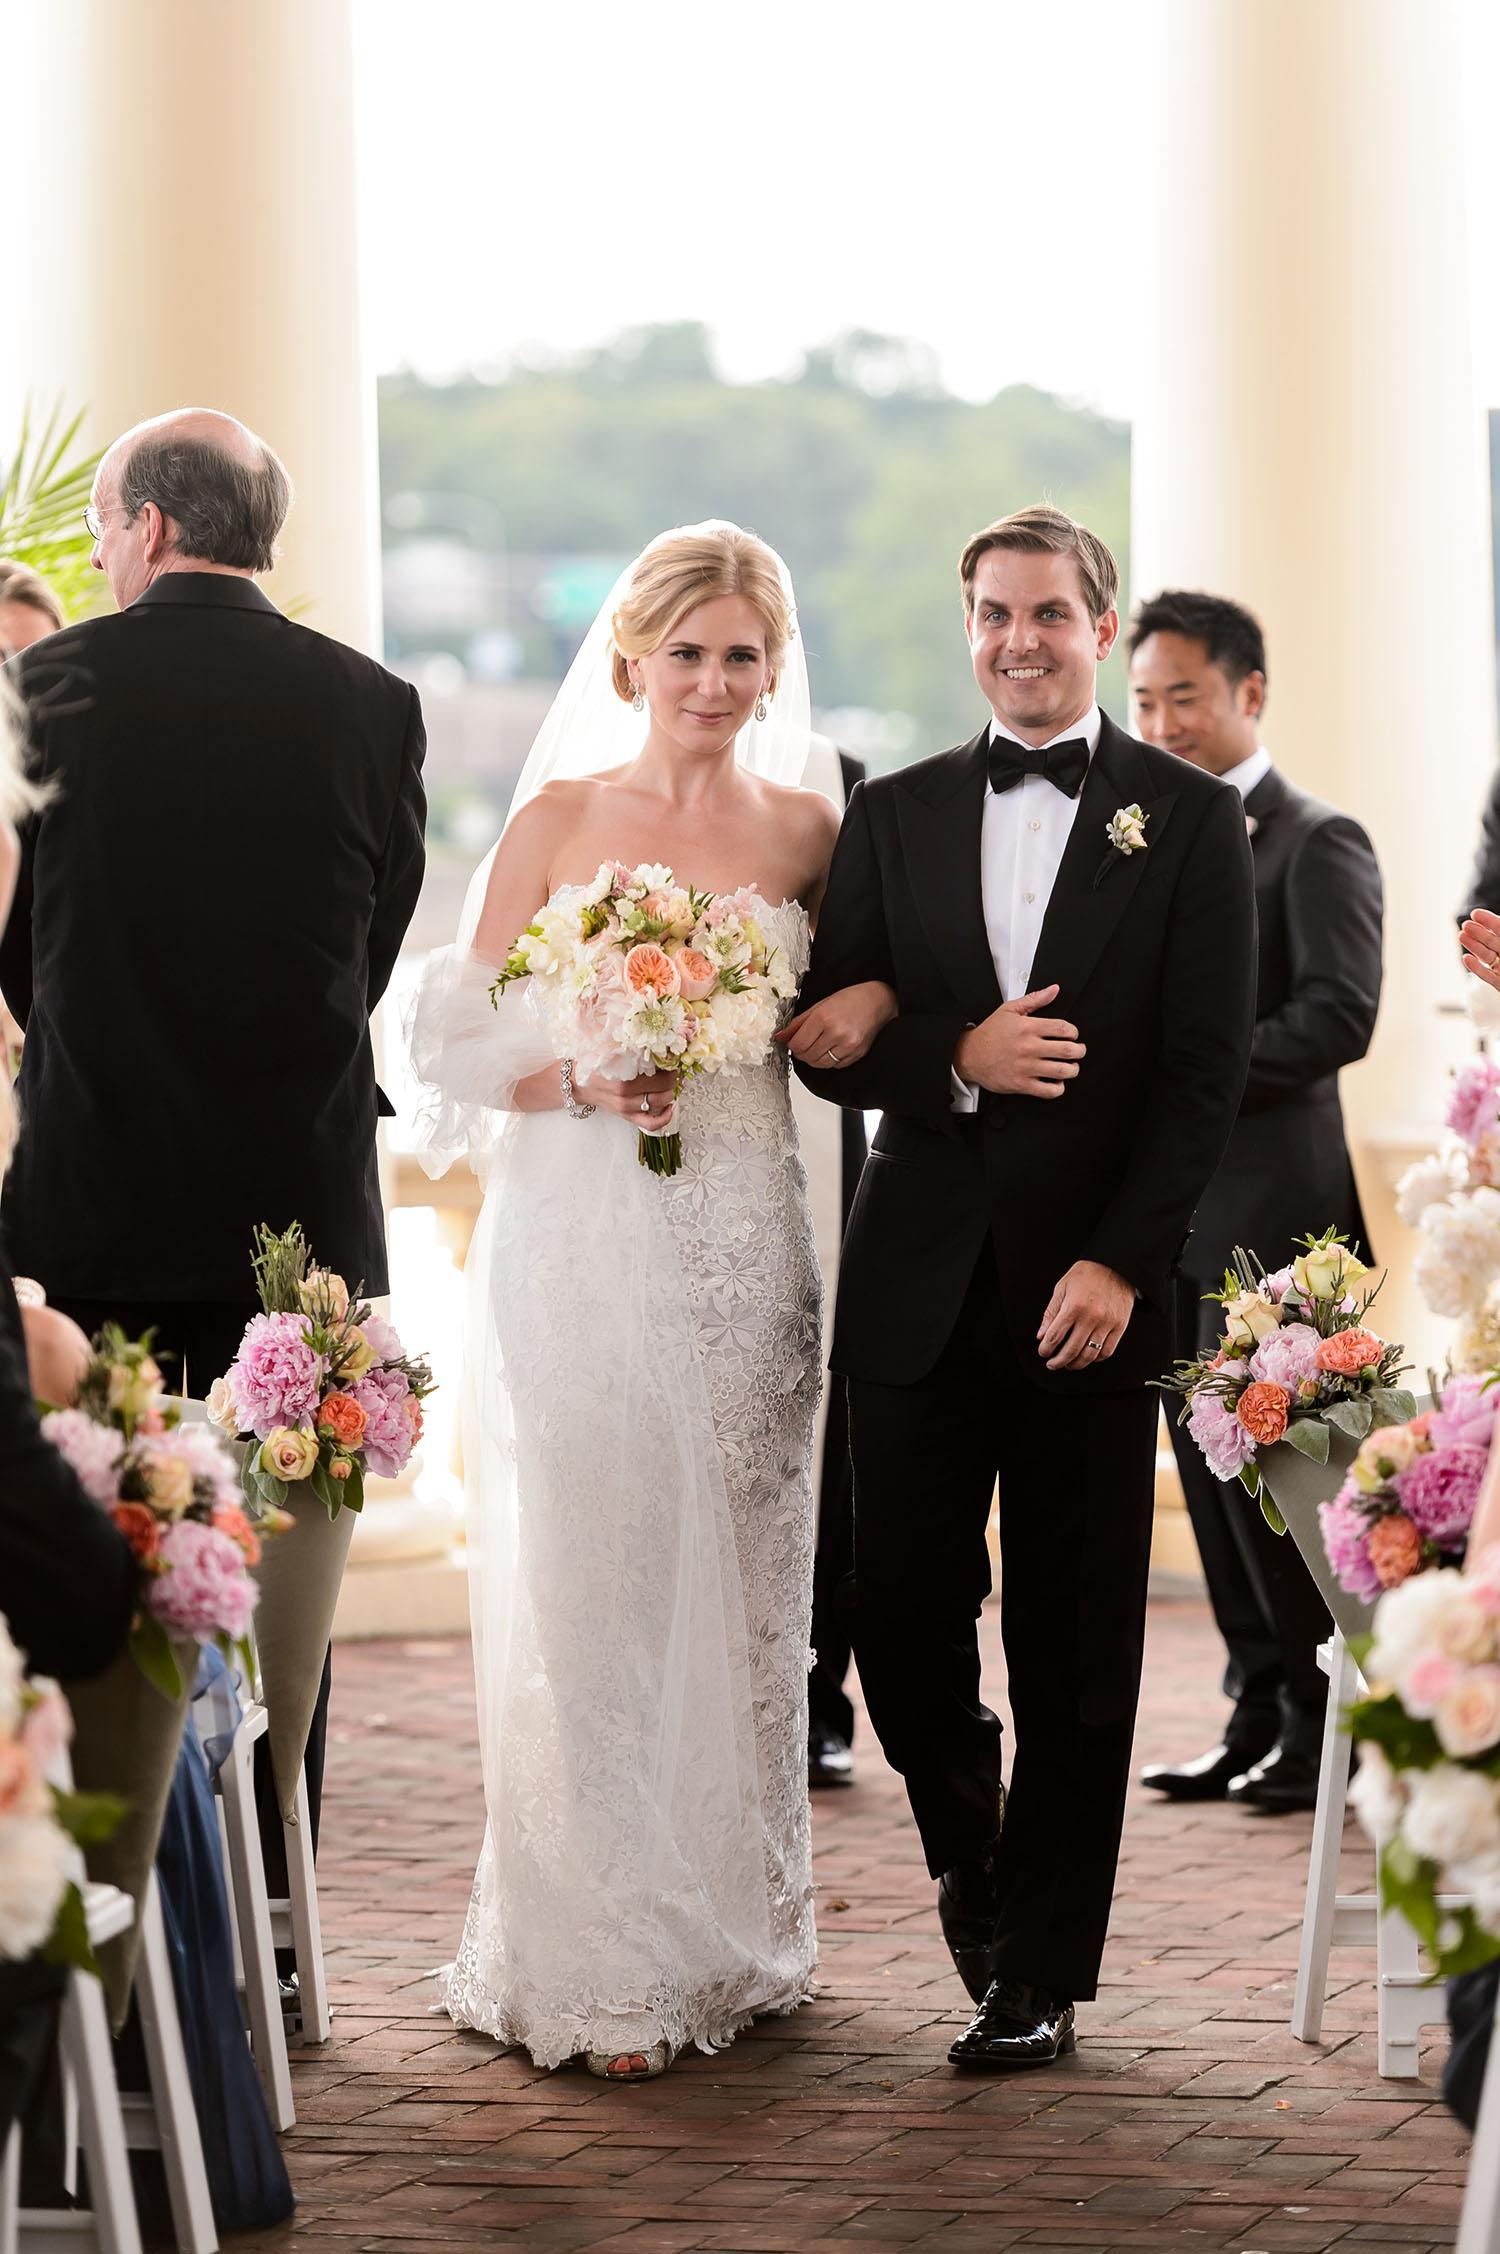 Susan Stripling  | Wedding Ceremony | The Water Works, Philadelphia, PA